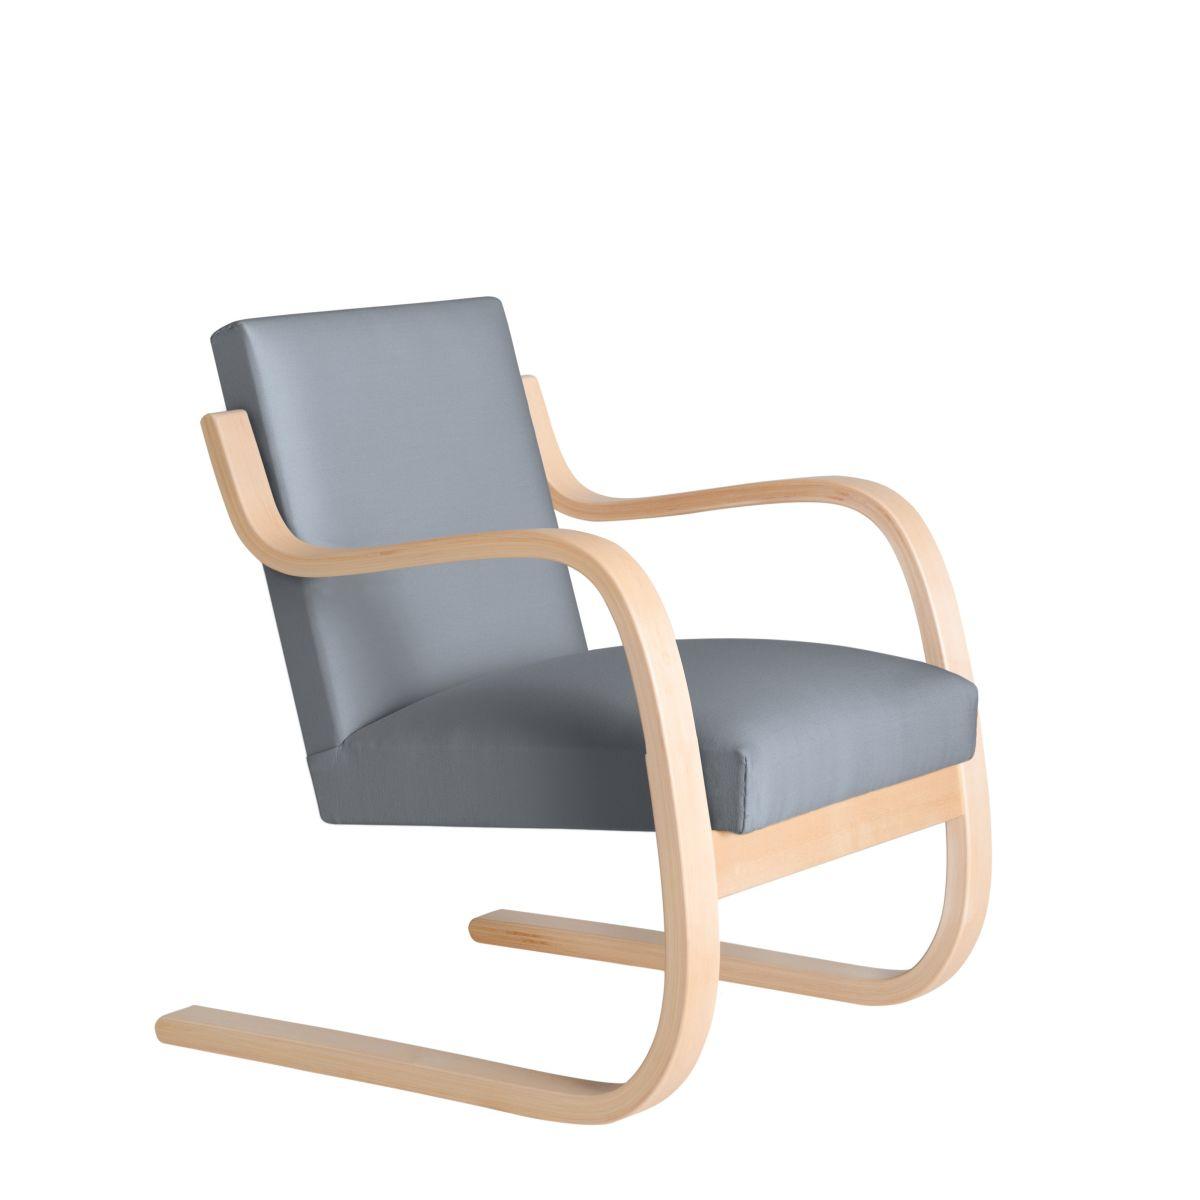 Armchair 402 Birch Clear Laquer Seat Fabric Upholstery Artek Grey 2494507